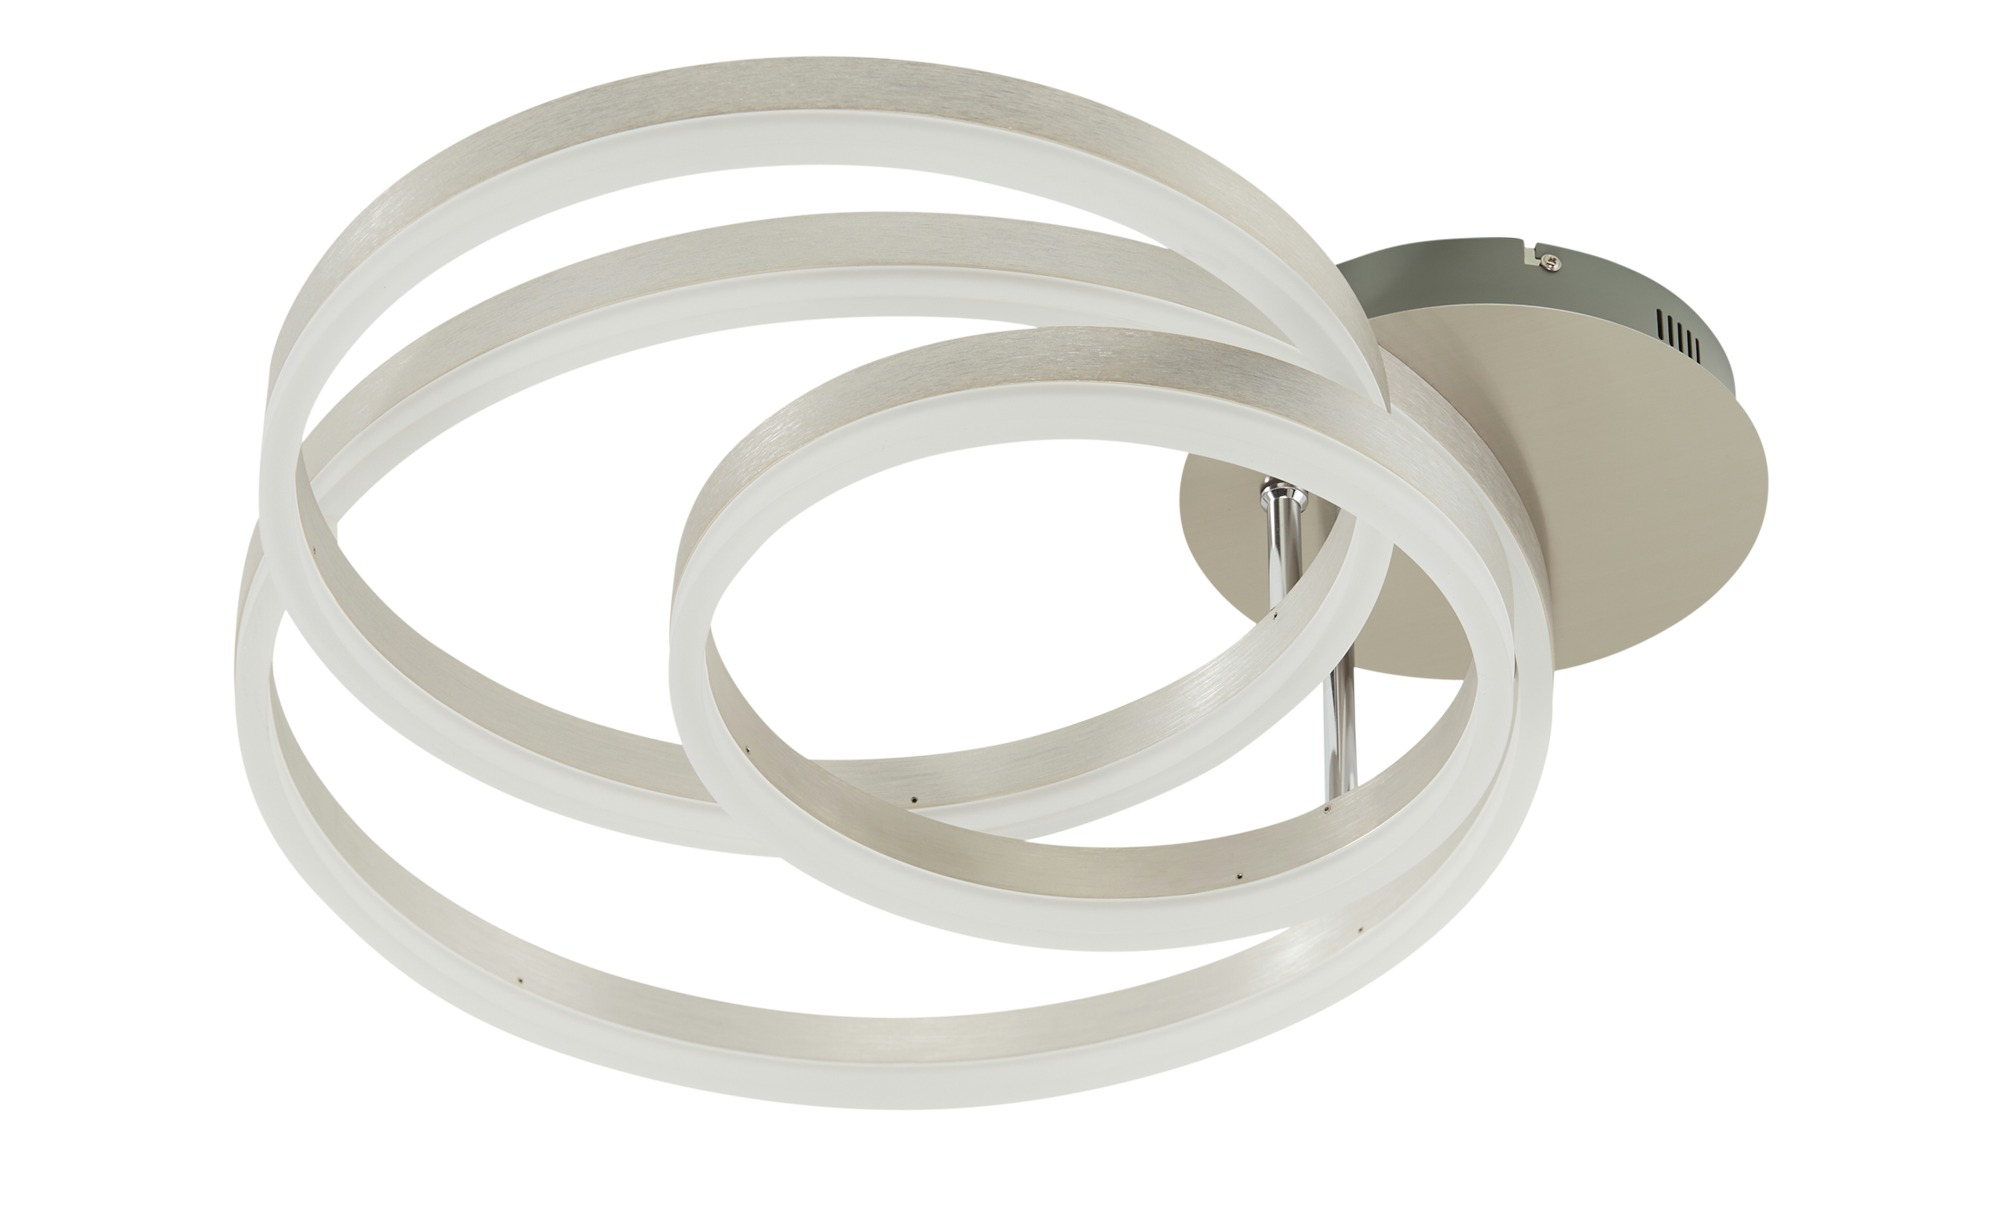 Meisterleuchten LED-Deckenleuchte, 3-flammig, Nickel matt `Ringe´ ¦ silber ¦ Maße (cm): B: 30 H: 14 Lampen & Leuchten > Innenleuchten > Deckenleuchten - Höffner